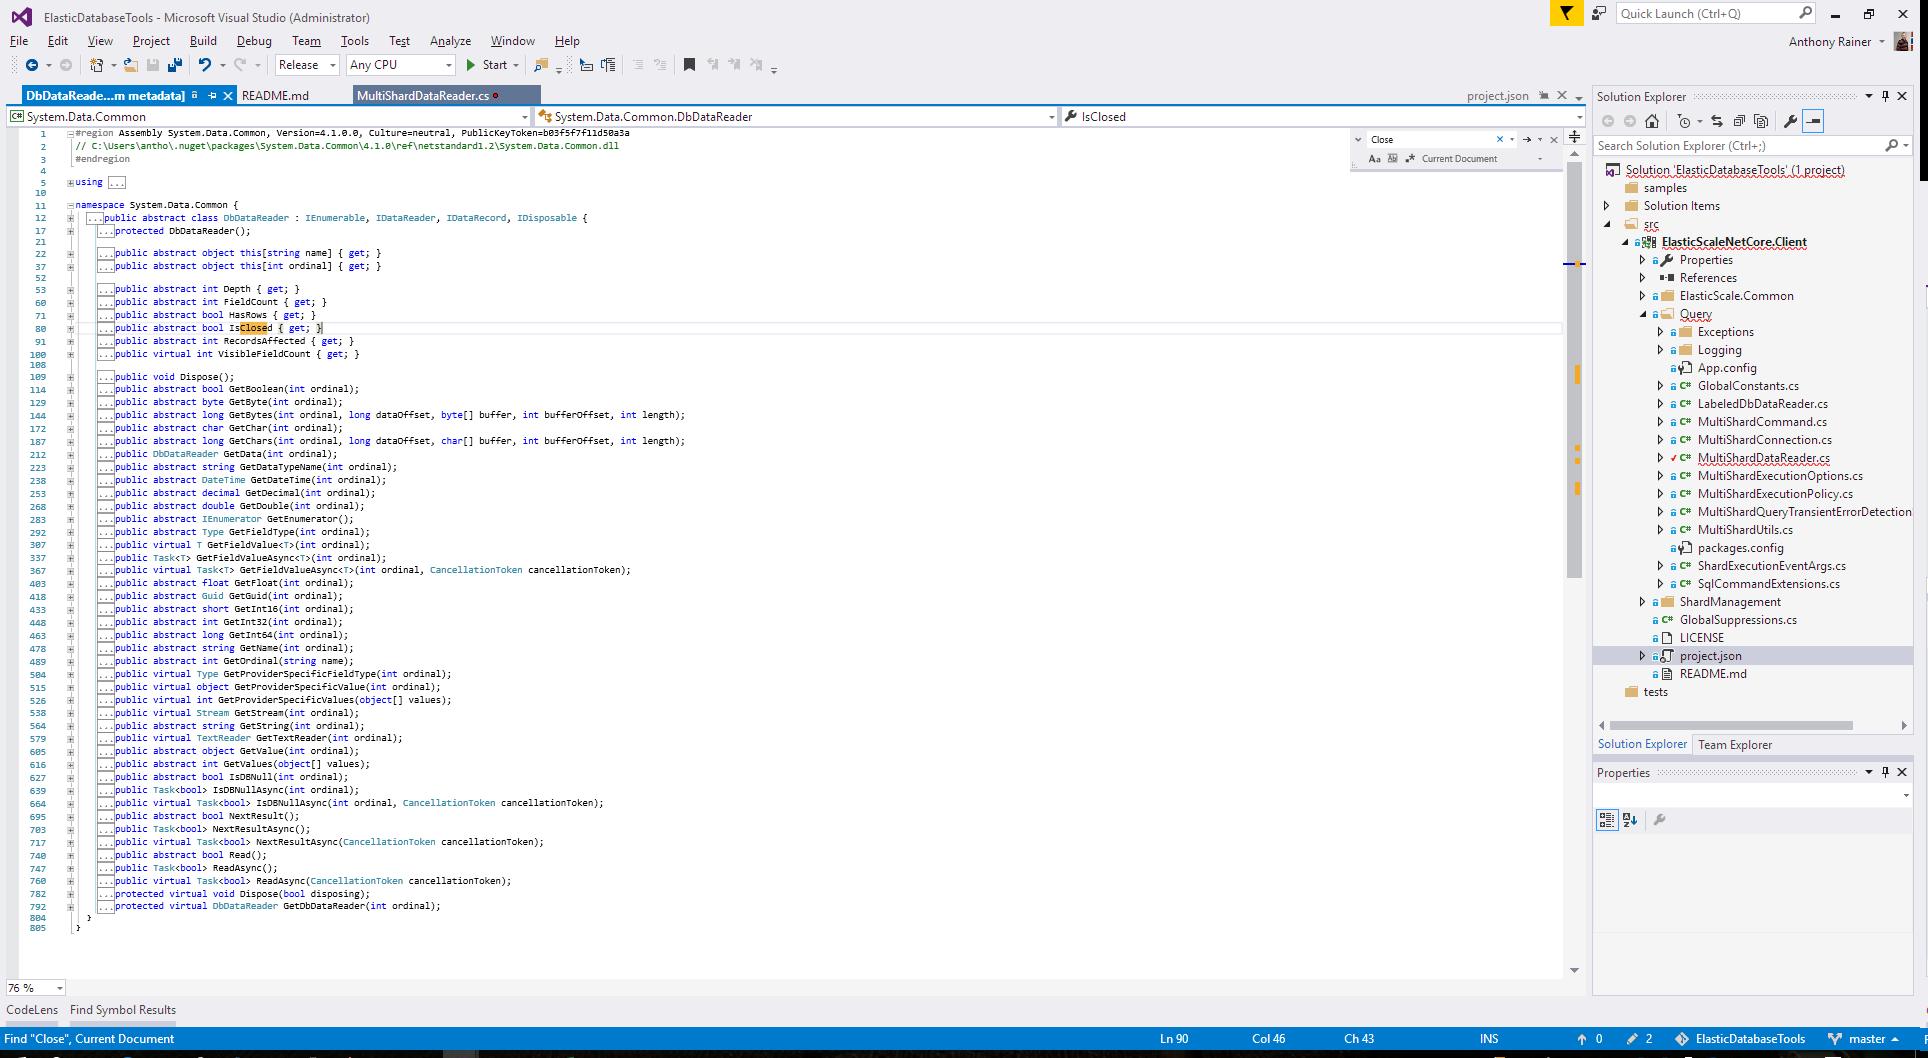 screenshot 2016-09-21 16 29 21